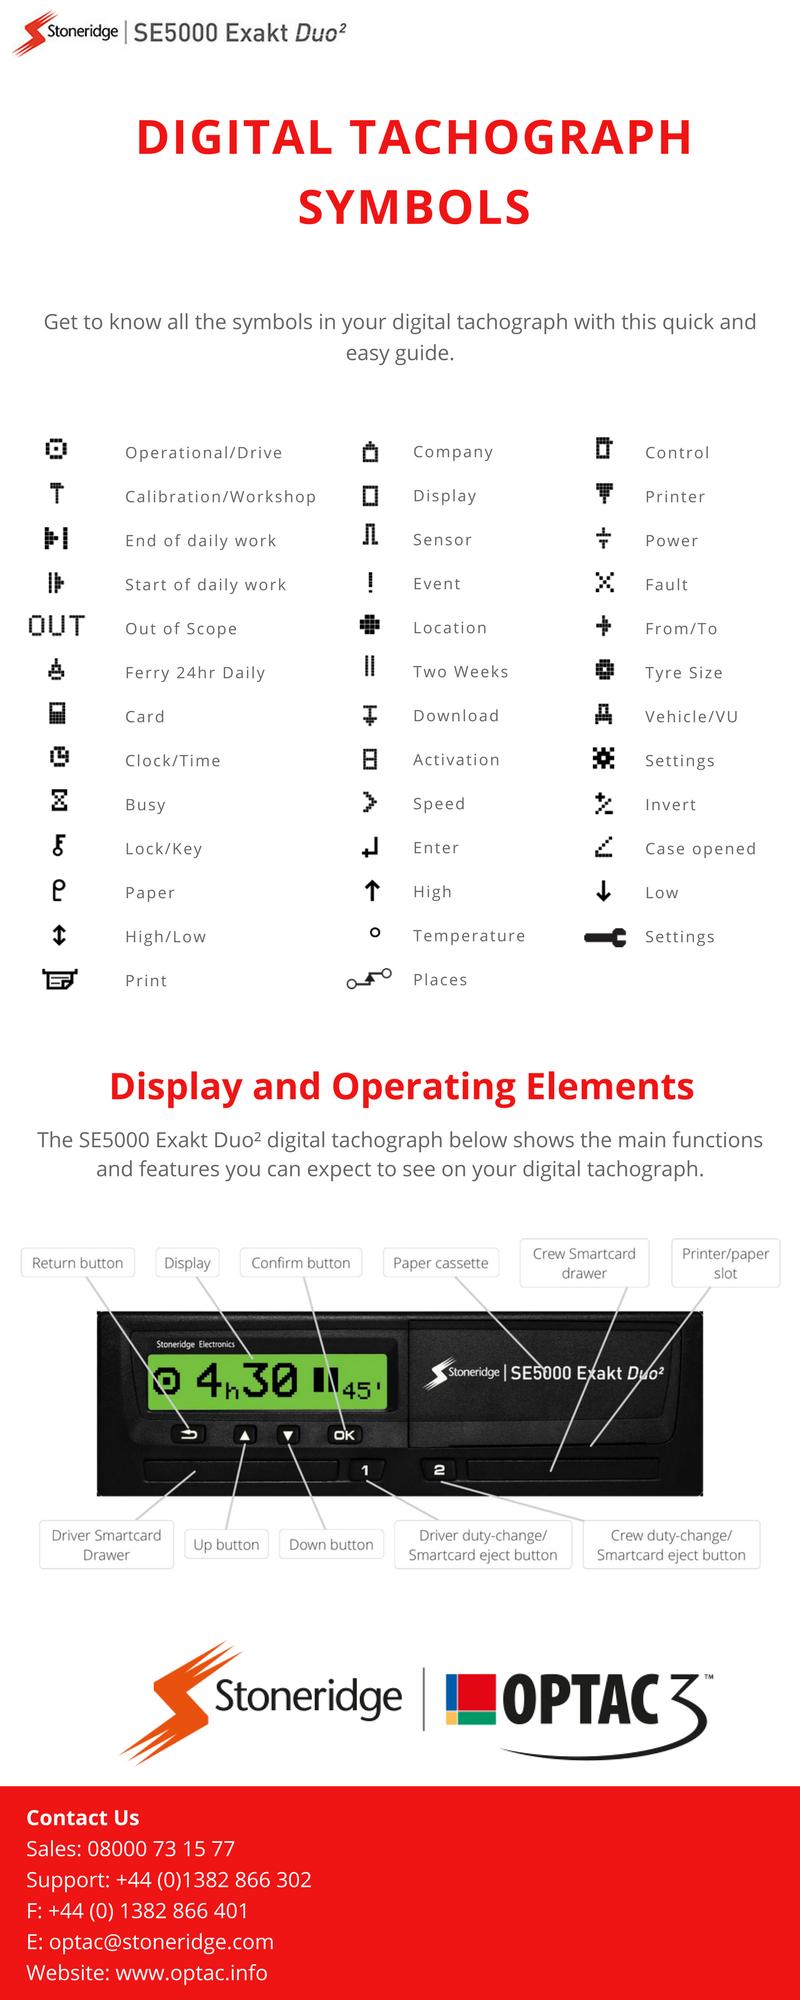 Digital tachograph symbols explained infographic optac uk digital tachograph symbols biocorpaavc Images